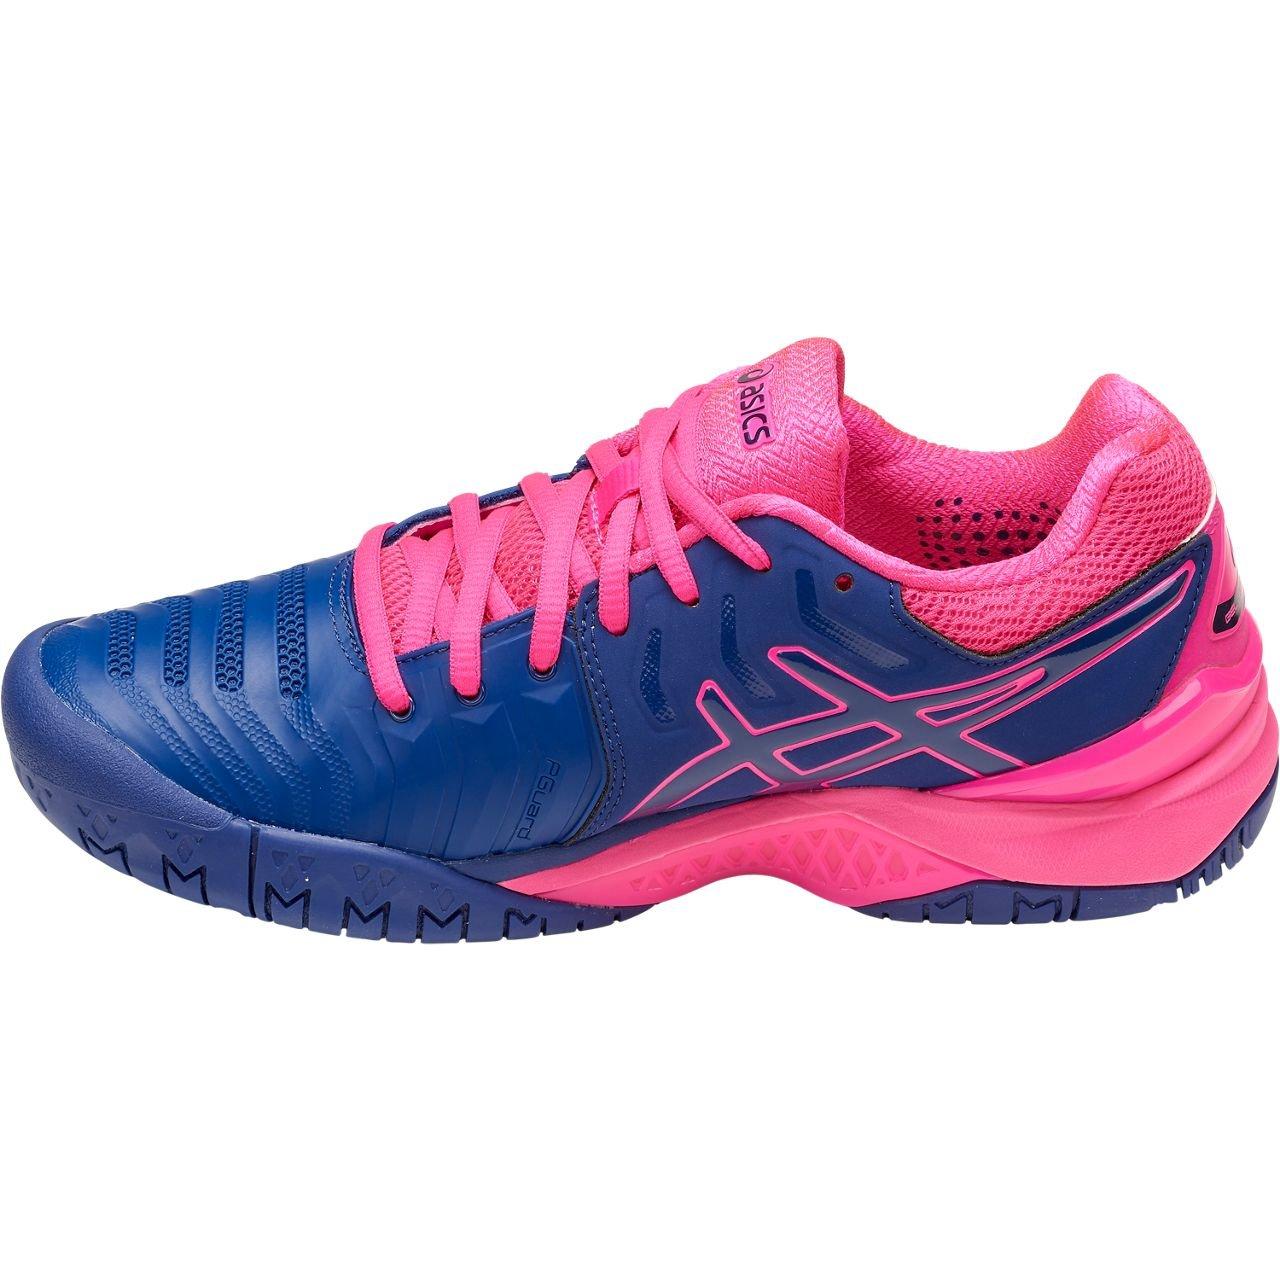 ASICS Womens Gel-Resolution 7 Tennis Shoe, Blue Print/Blue Print, Size 5.5